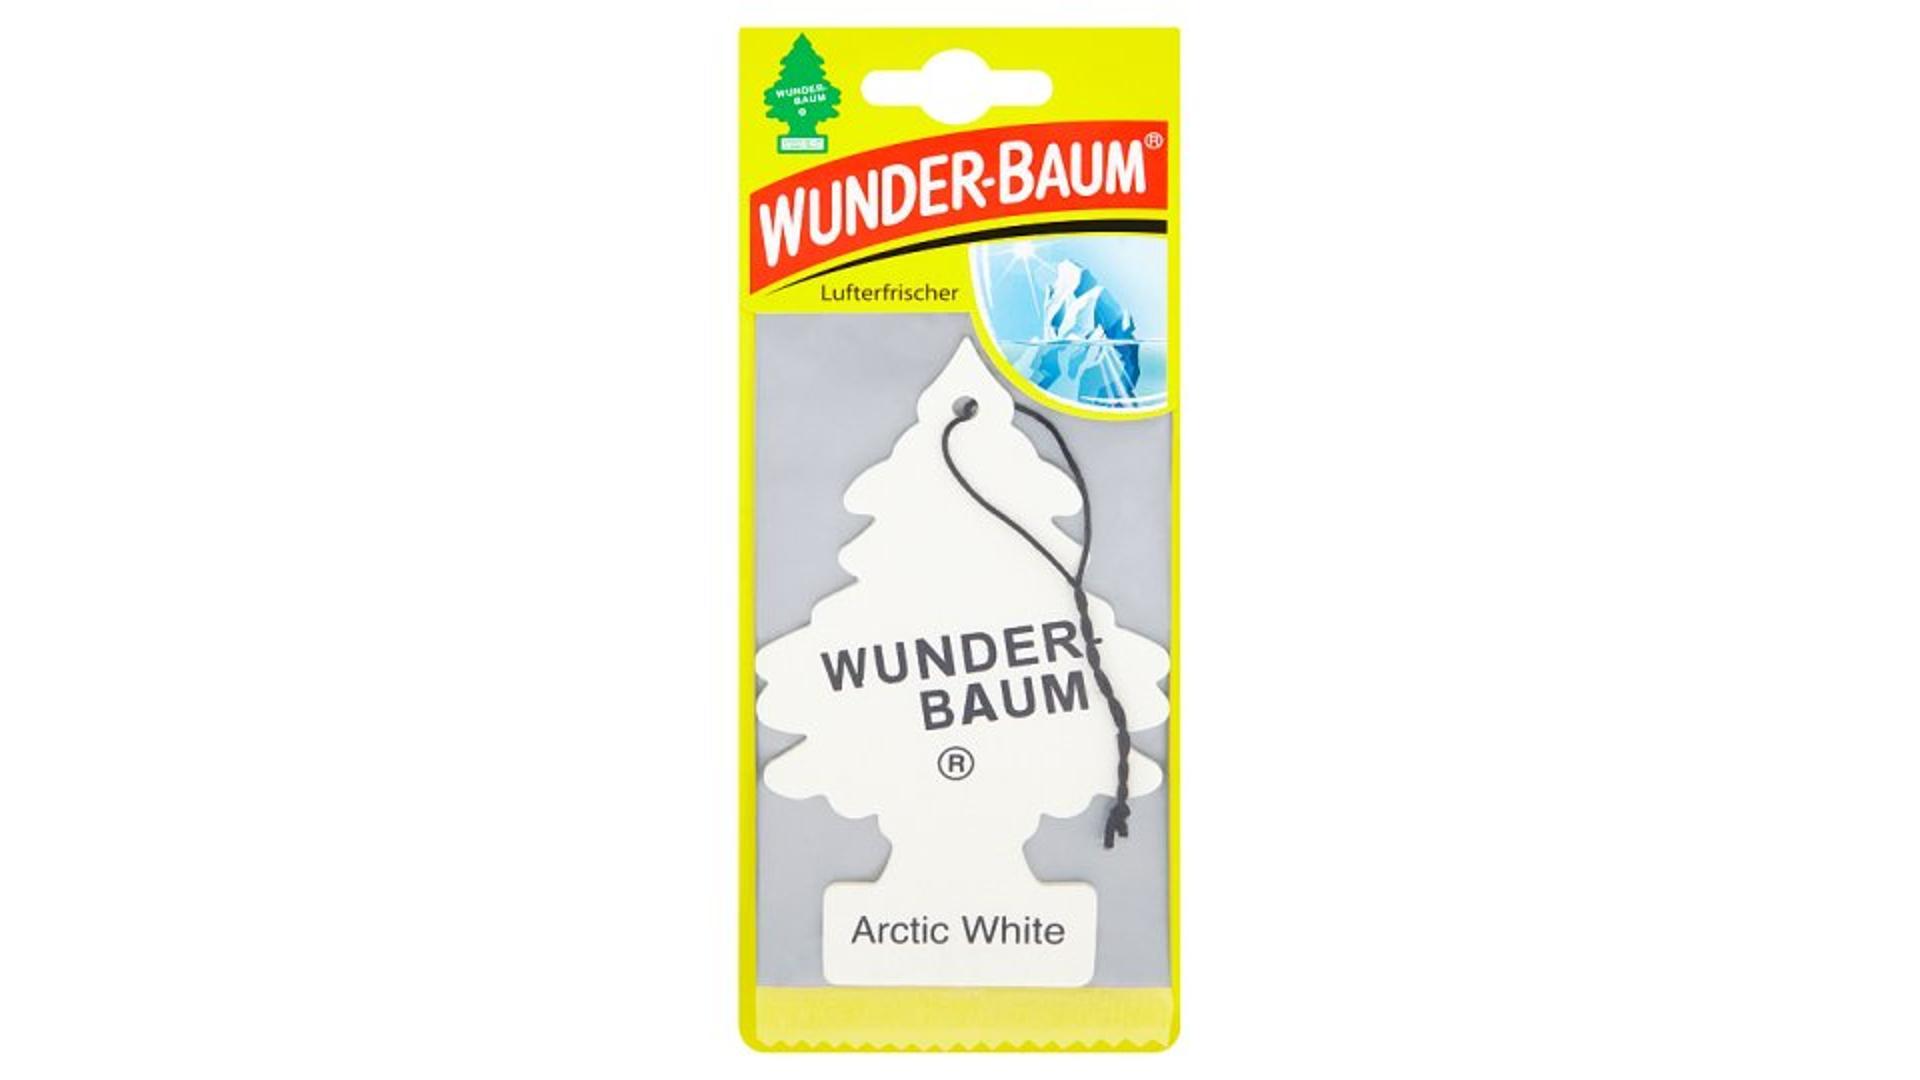 WUNDER BAUM Osvěžovač vzduchu Artic white